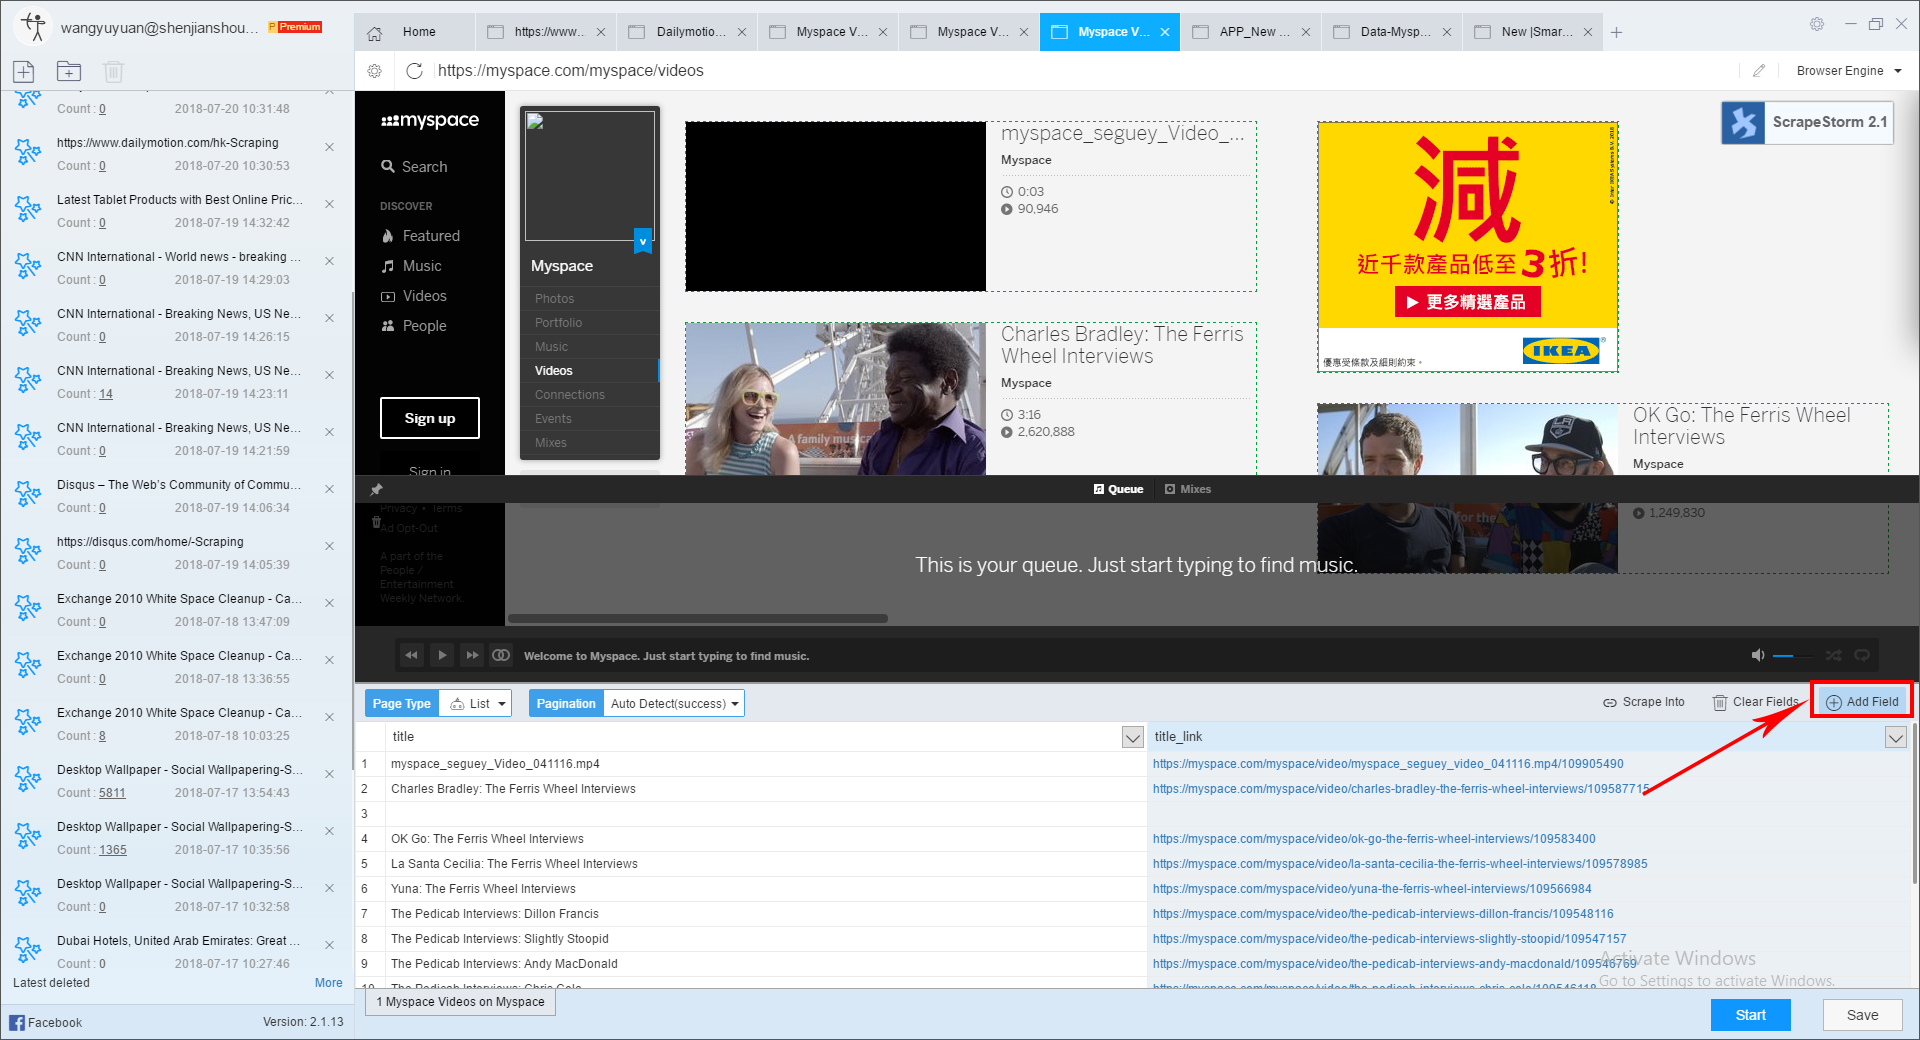 ScrapeStorm Tutorial : How to scrape data about videos from Myspace com